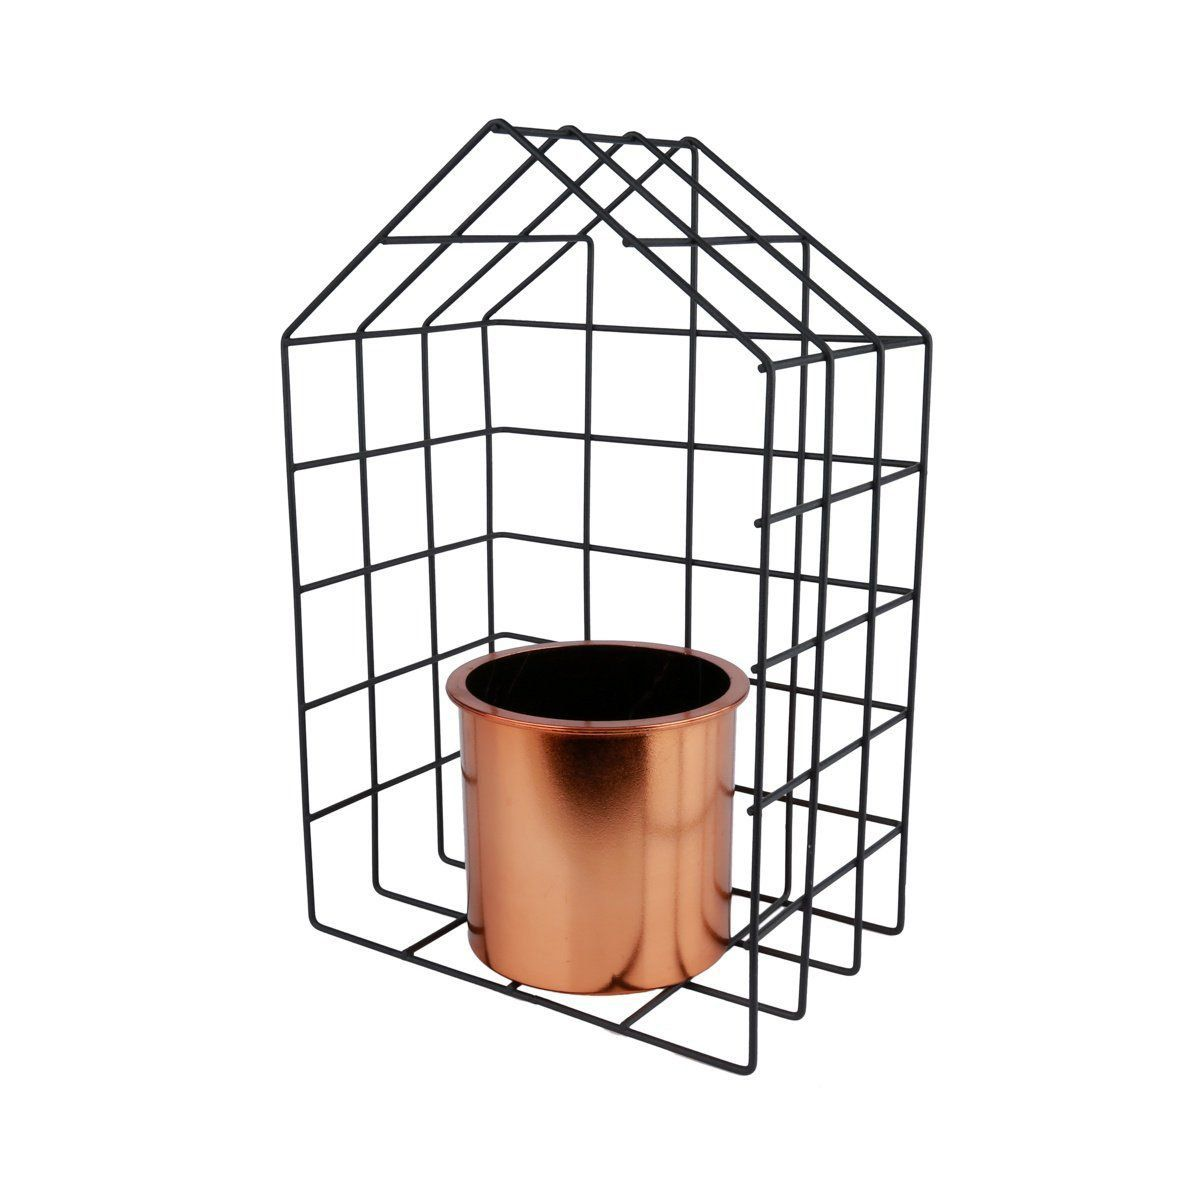 Vaso Geométrico Bronze com Suporte de Metal House 29cm x 19cm - 40080